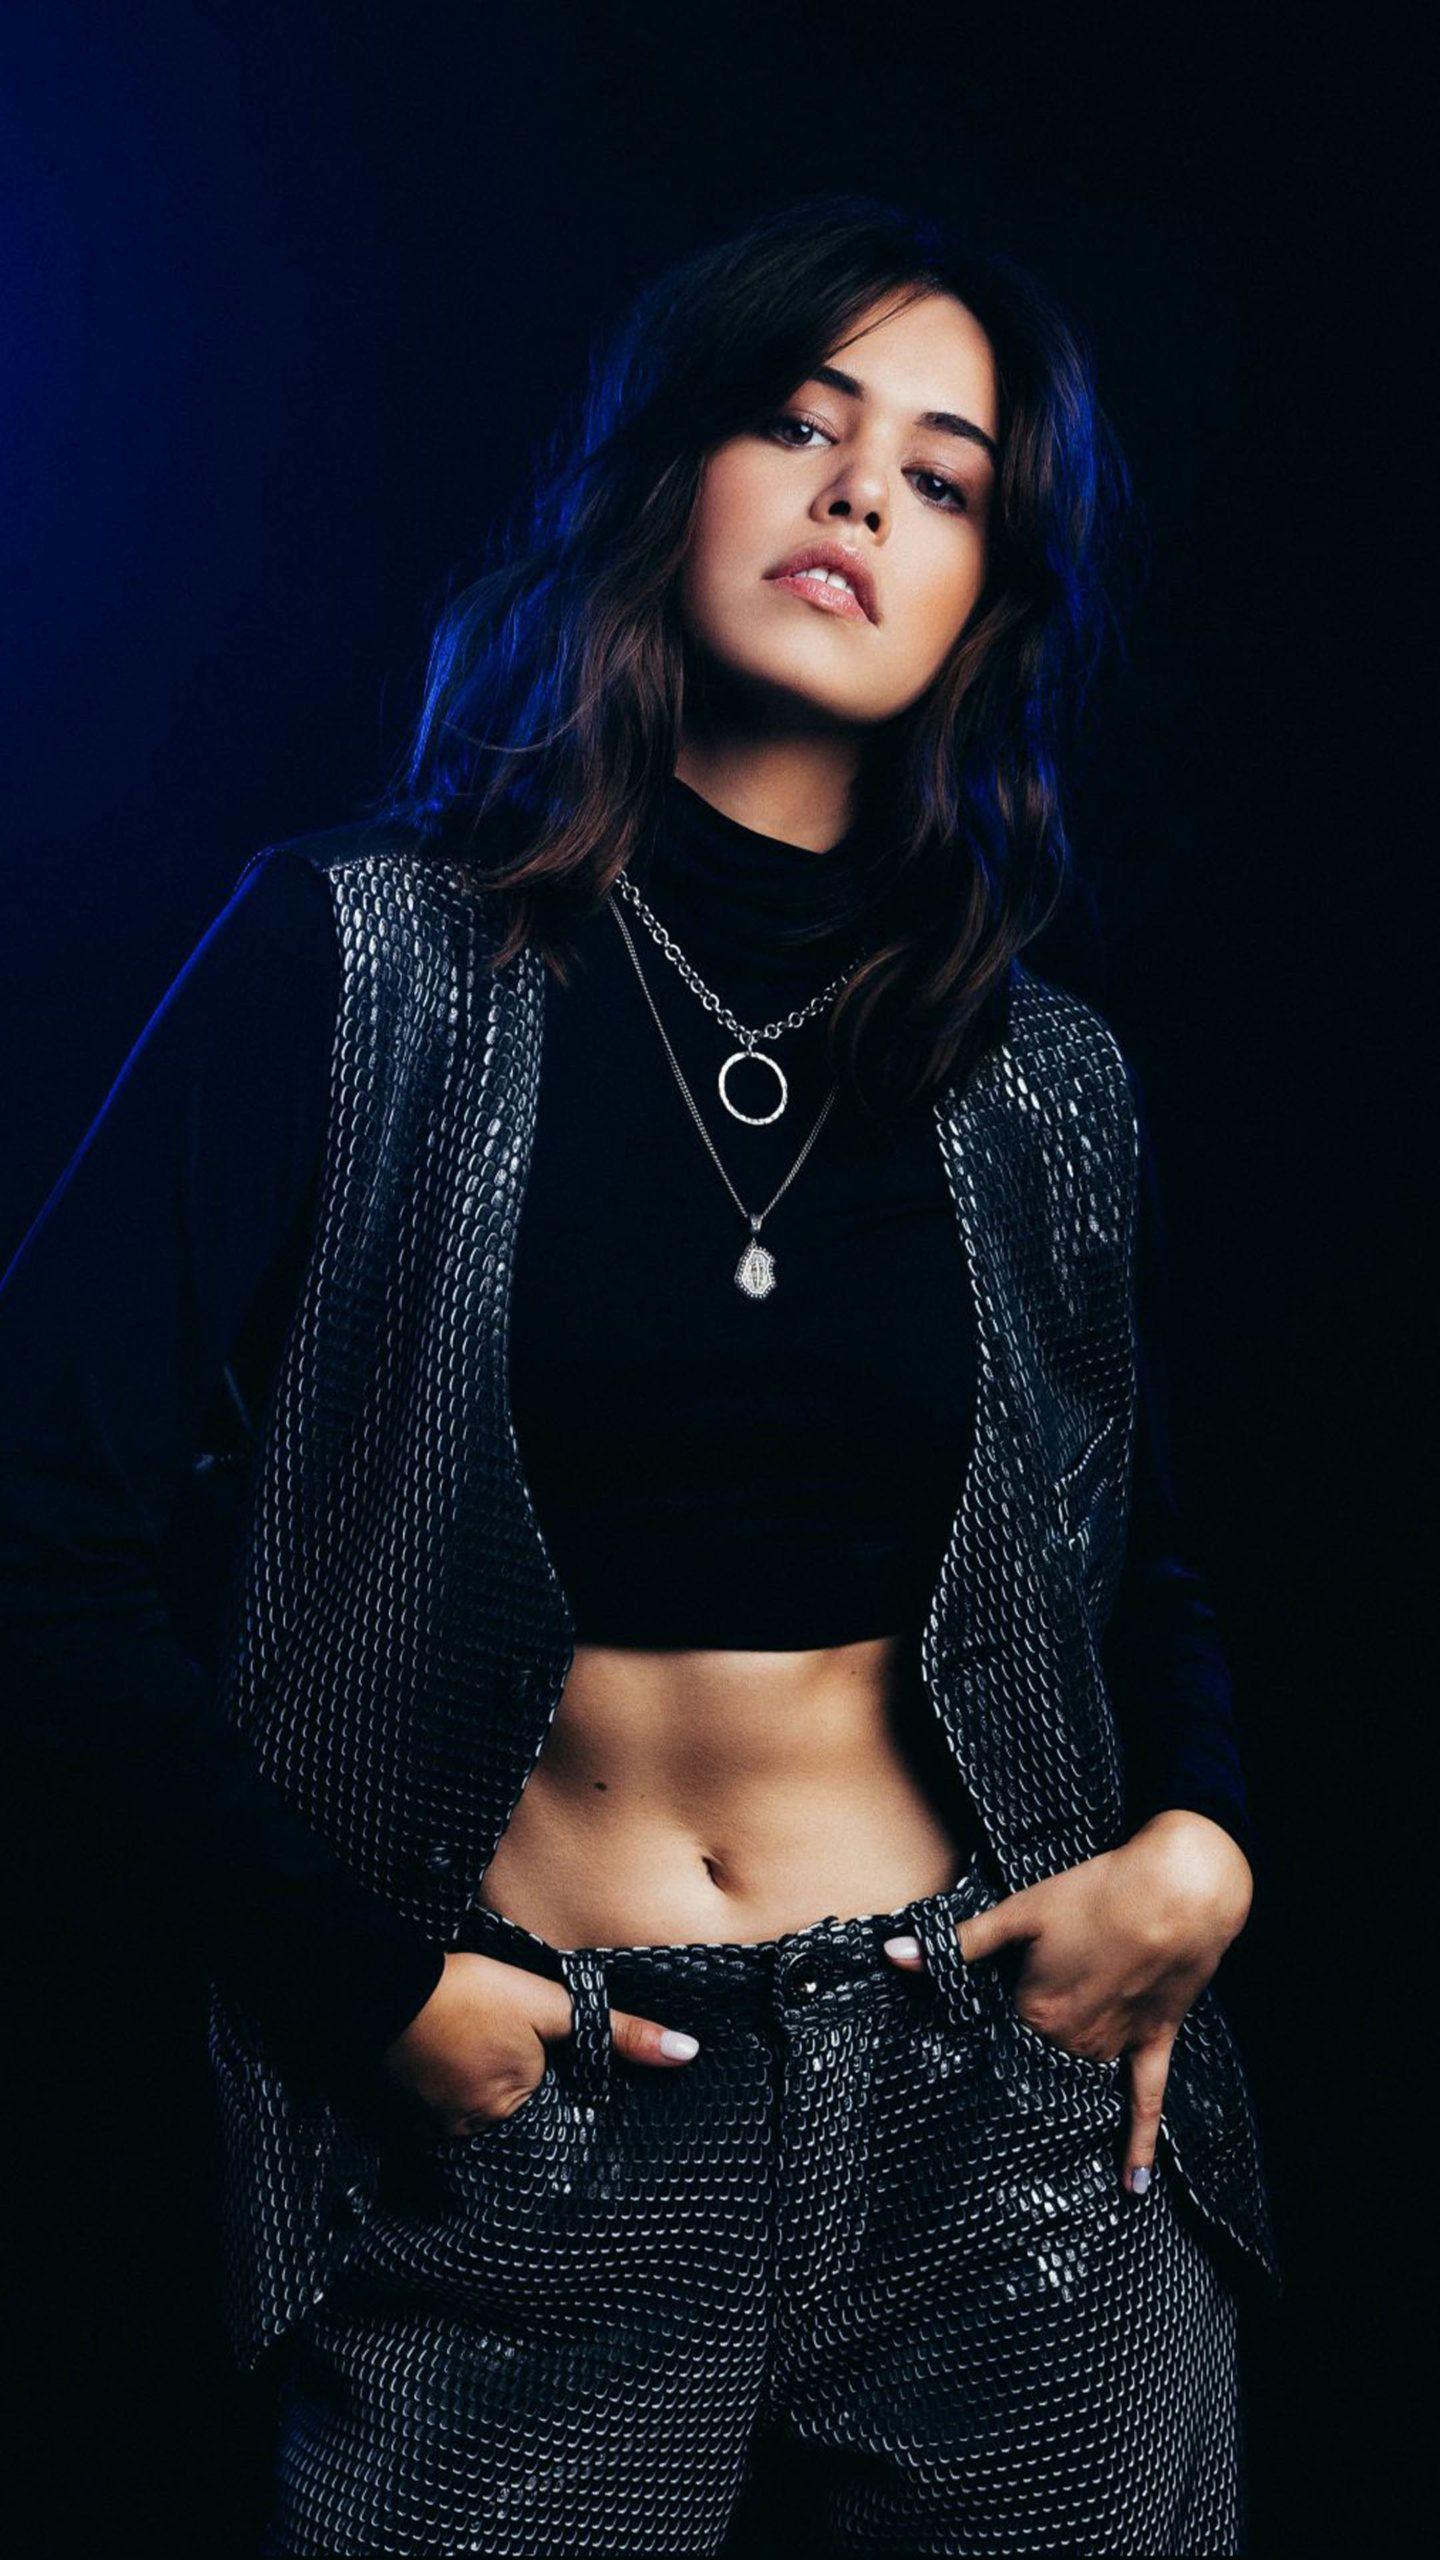 Kaylee sexy Kaylee Hartung